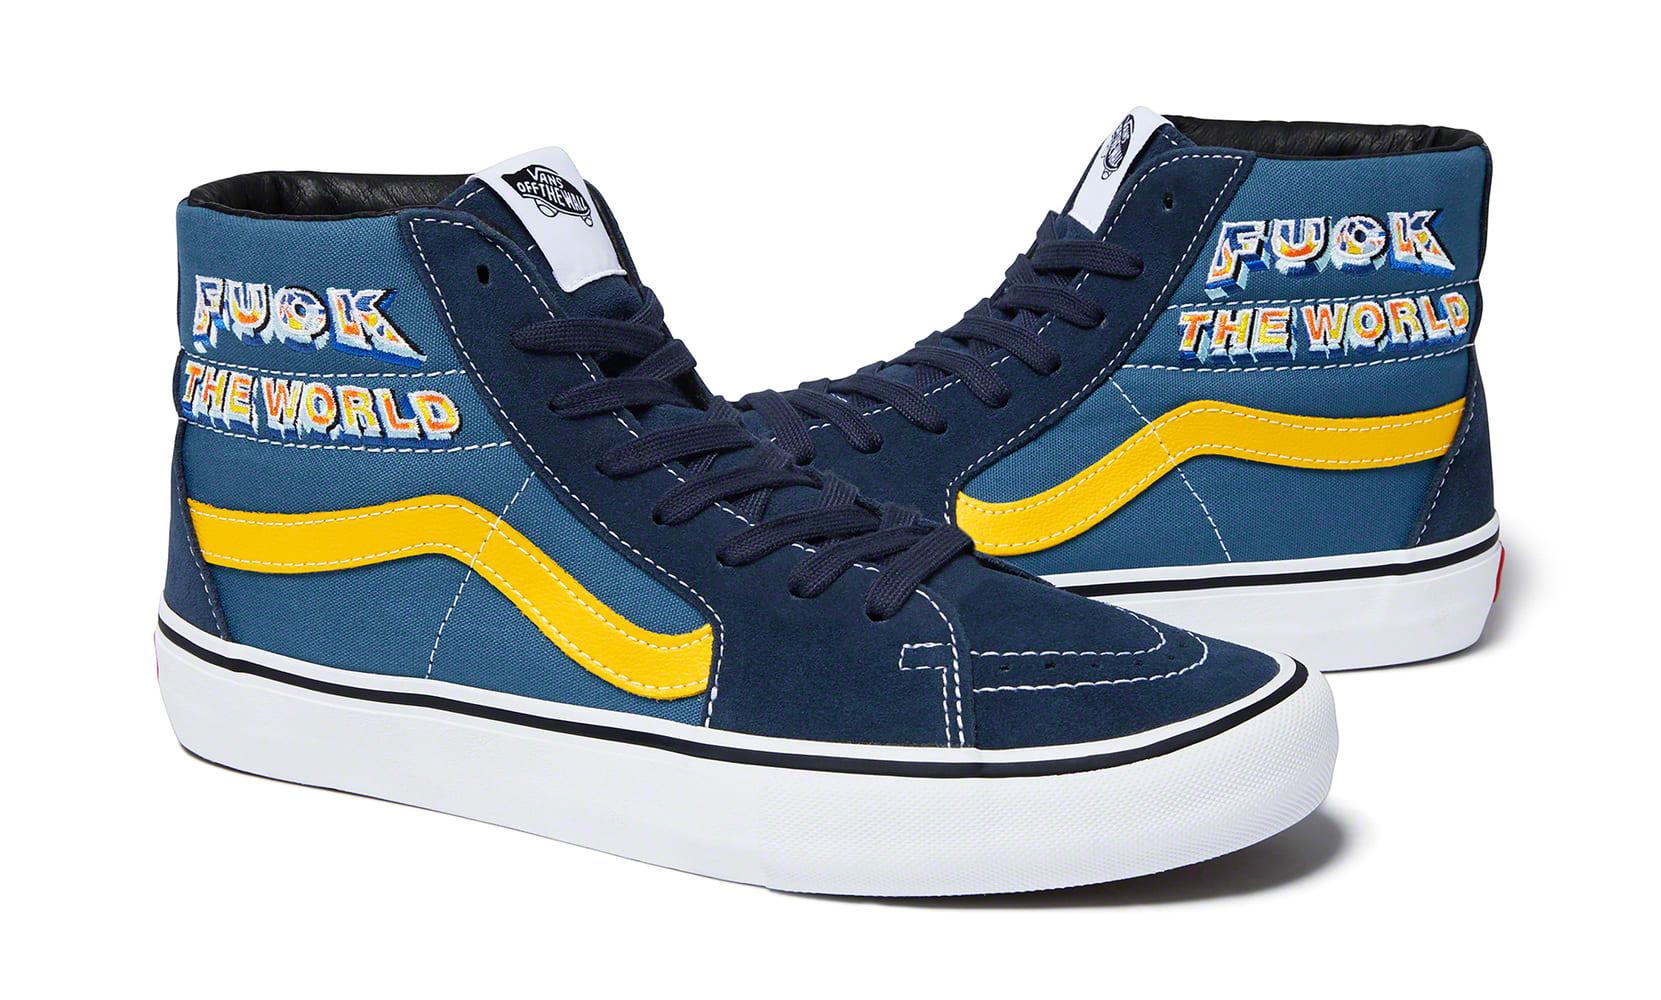 supreme-vans-sk8-hi-fuck-the-world-fw-2019-blue-yellow